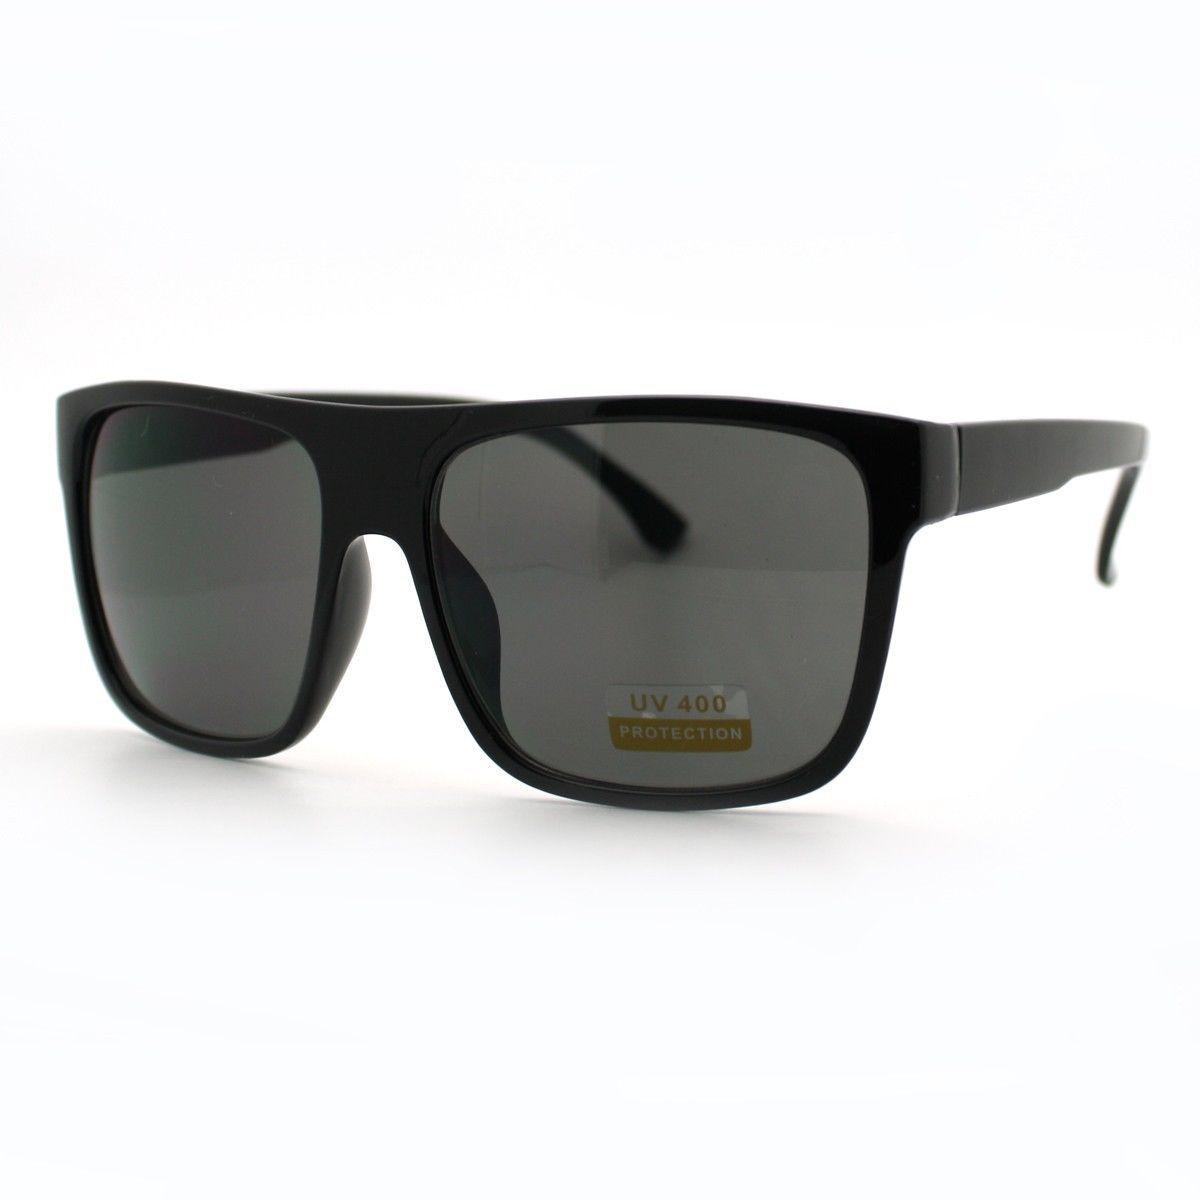 All Black Sunglasses Classic Square Fashion Shades for Men and Women